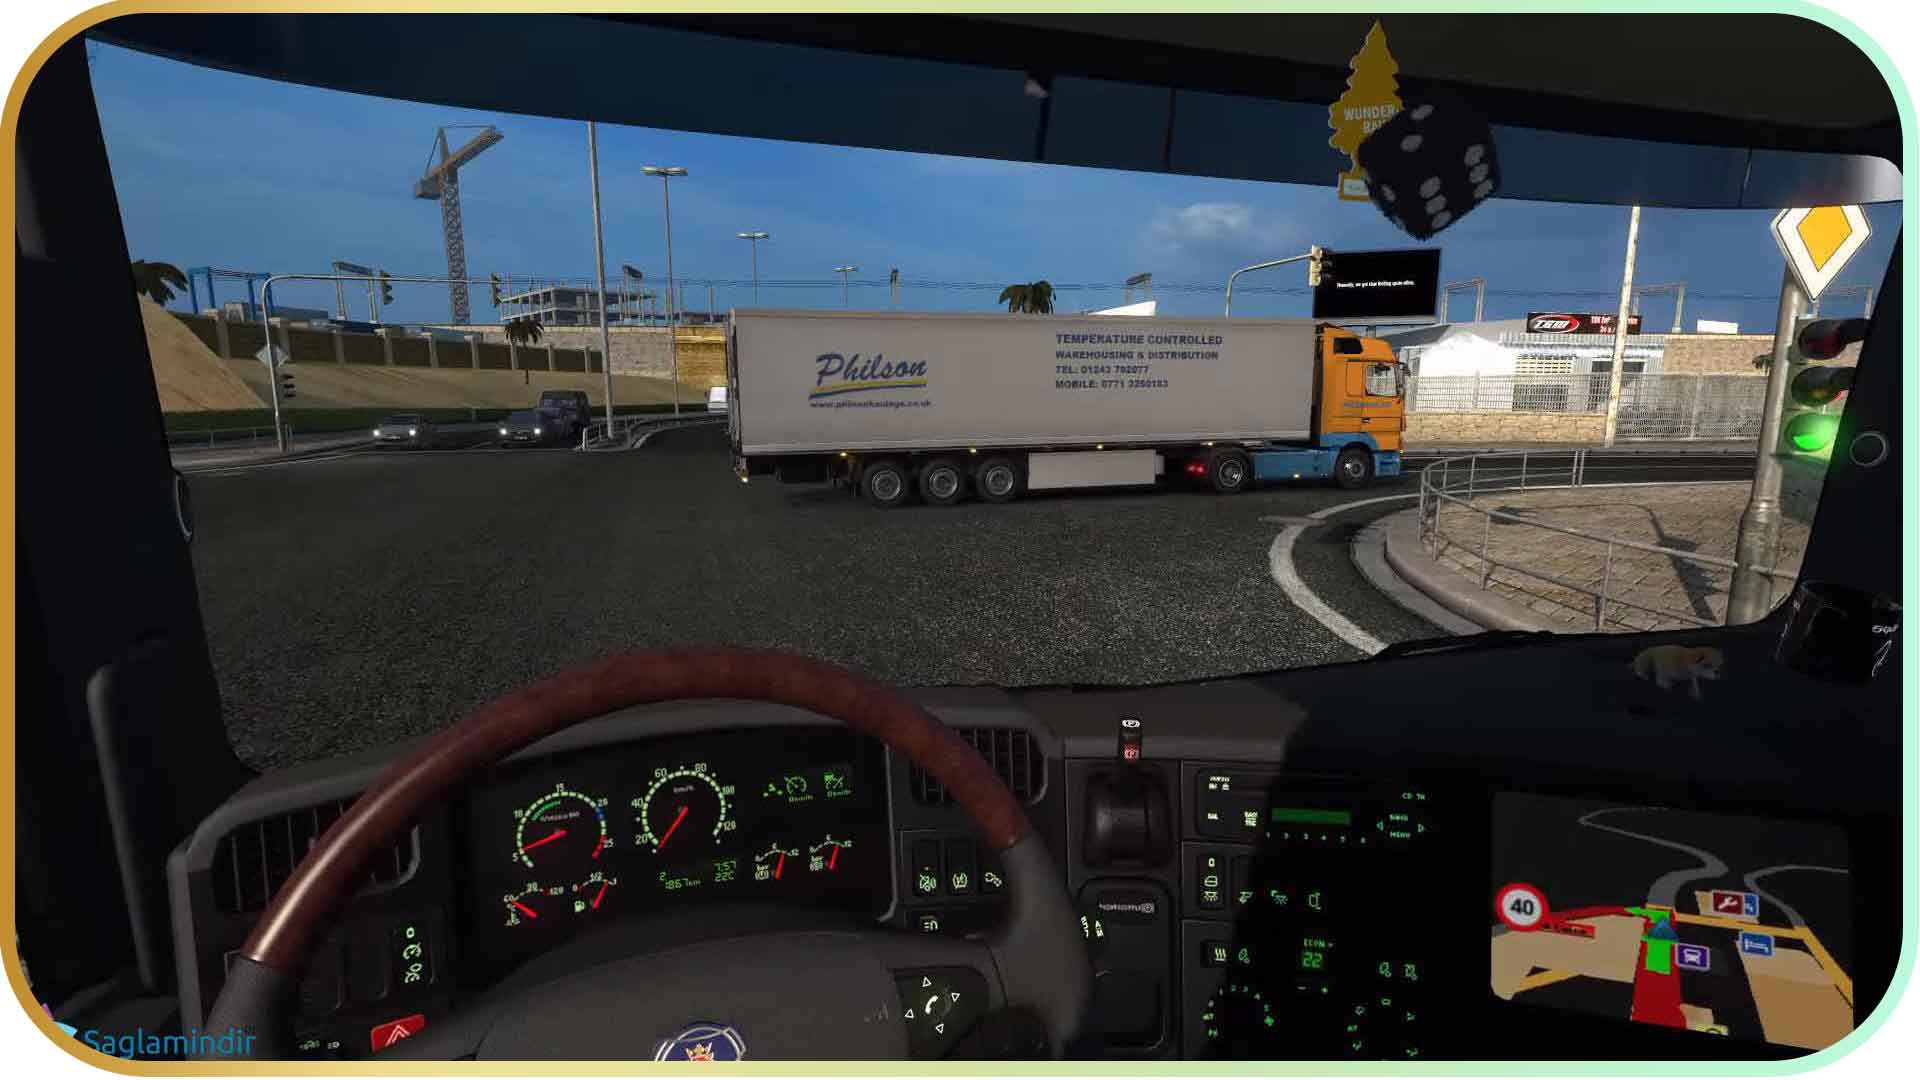 Scania Truck Driving Simulator saglamindir